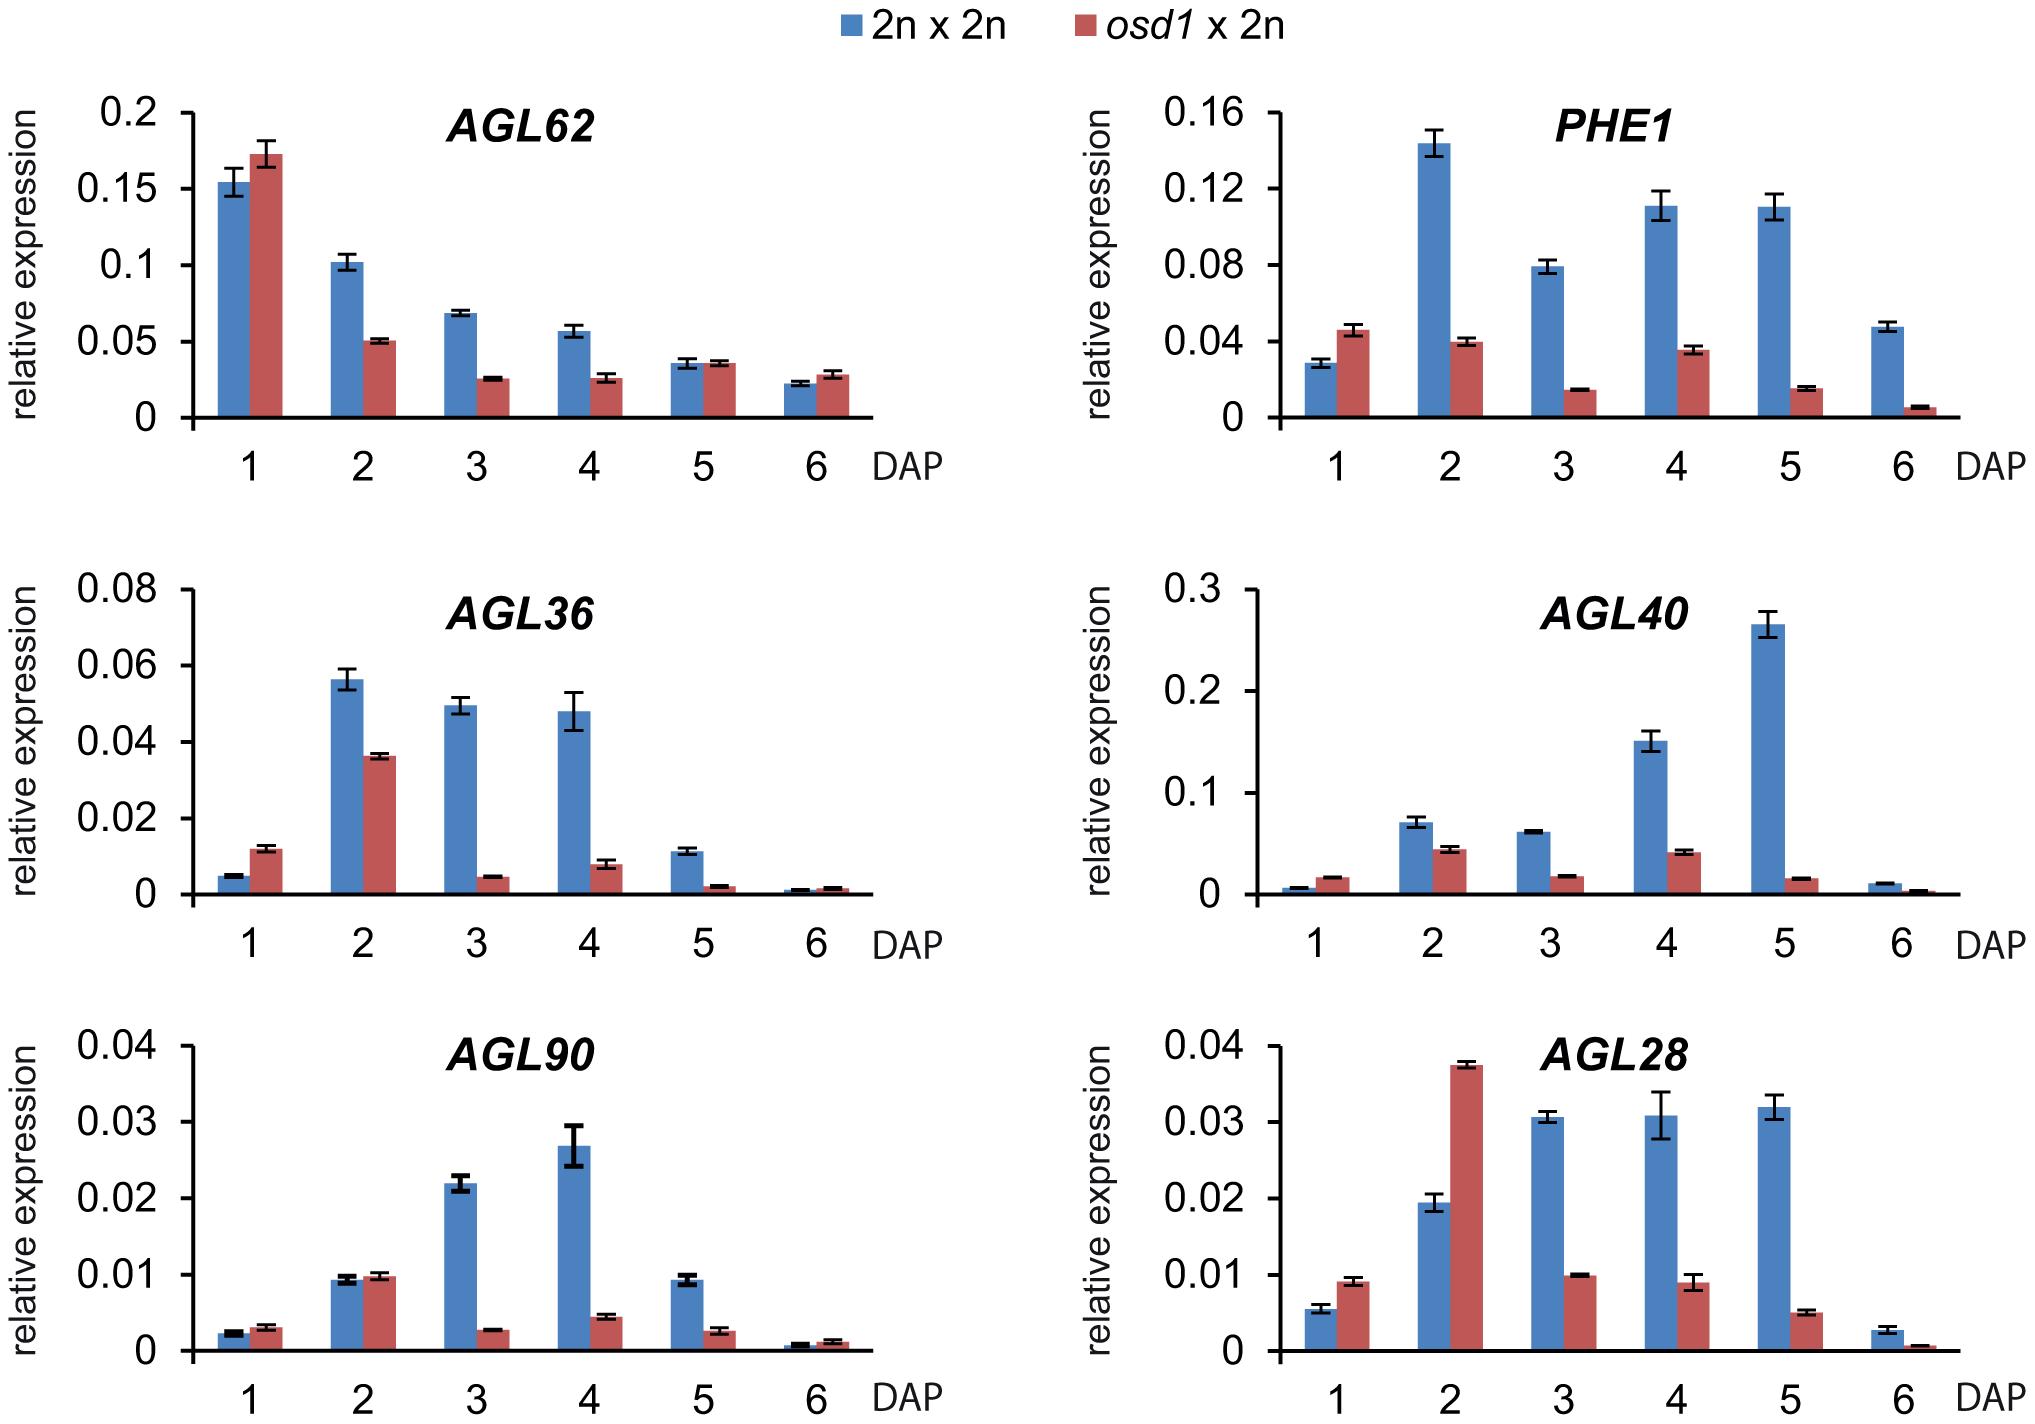 Expression of <i>AGL</i> MADS Box Genes Is Decreased in <i>osd1</i>×2n Crosses.